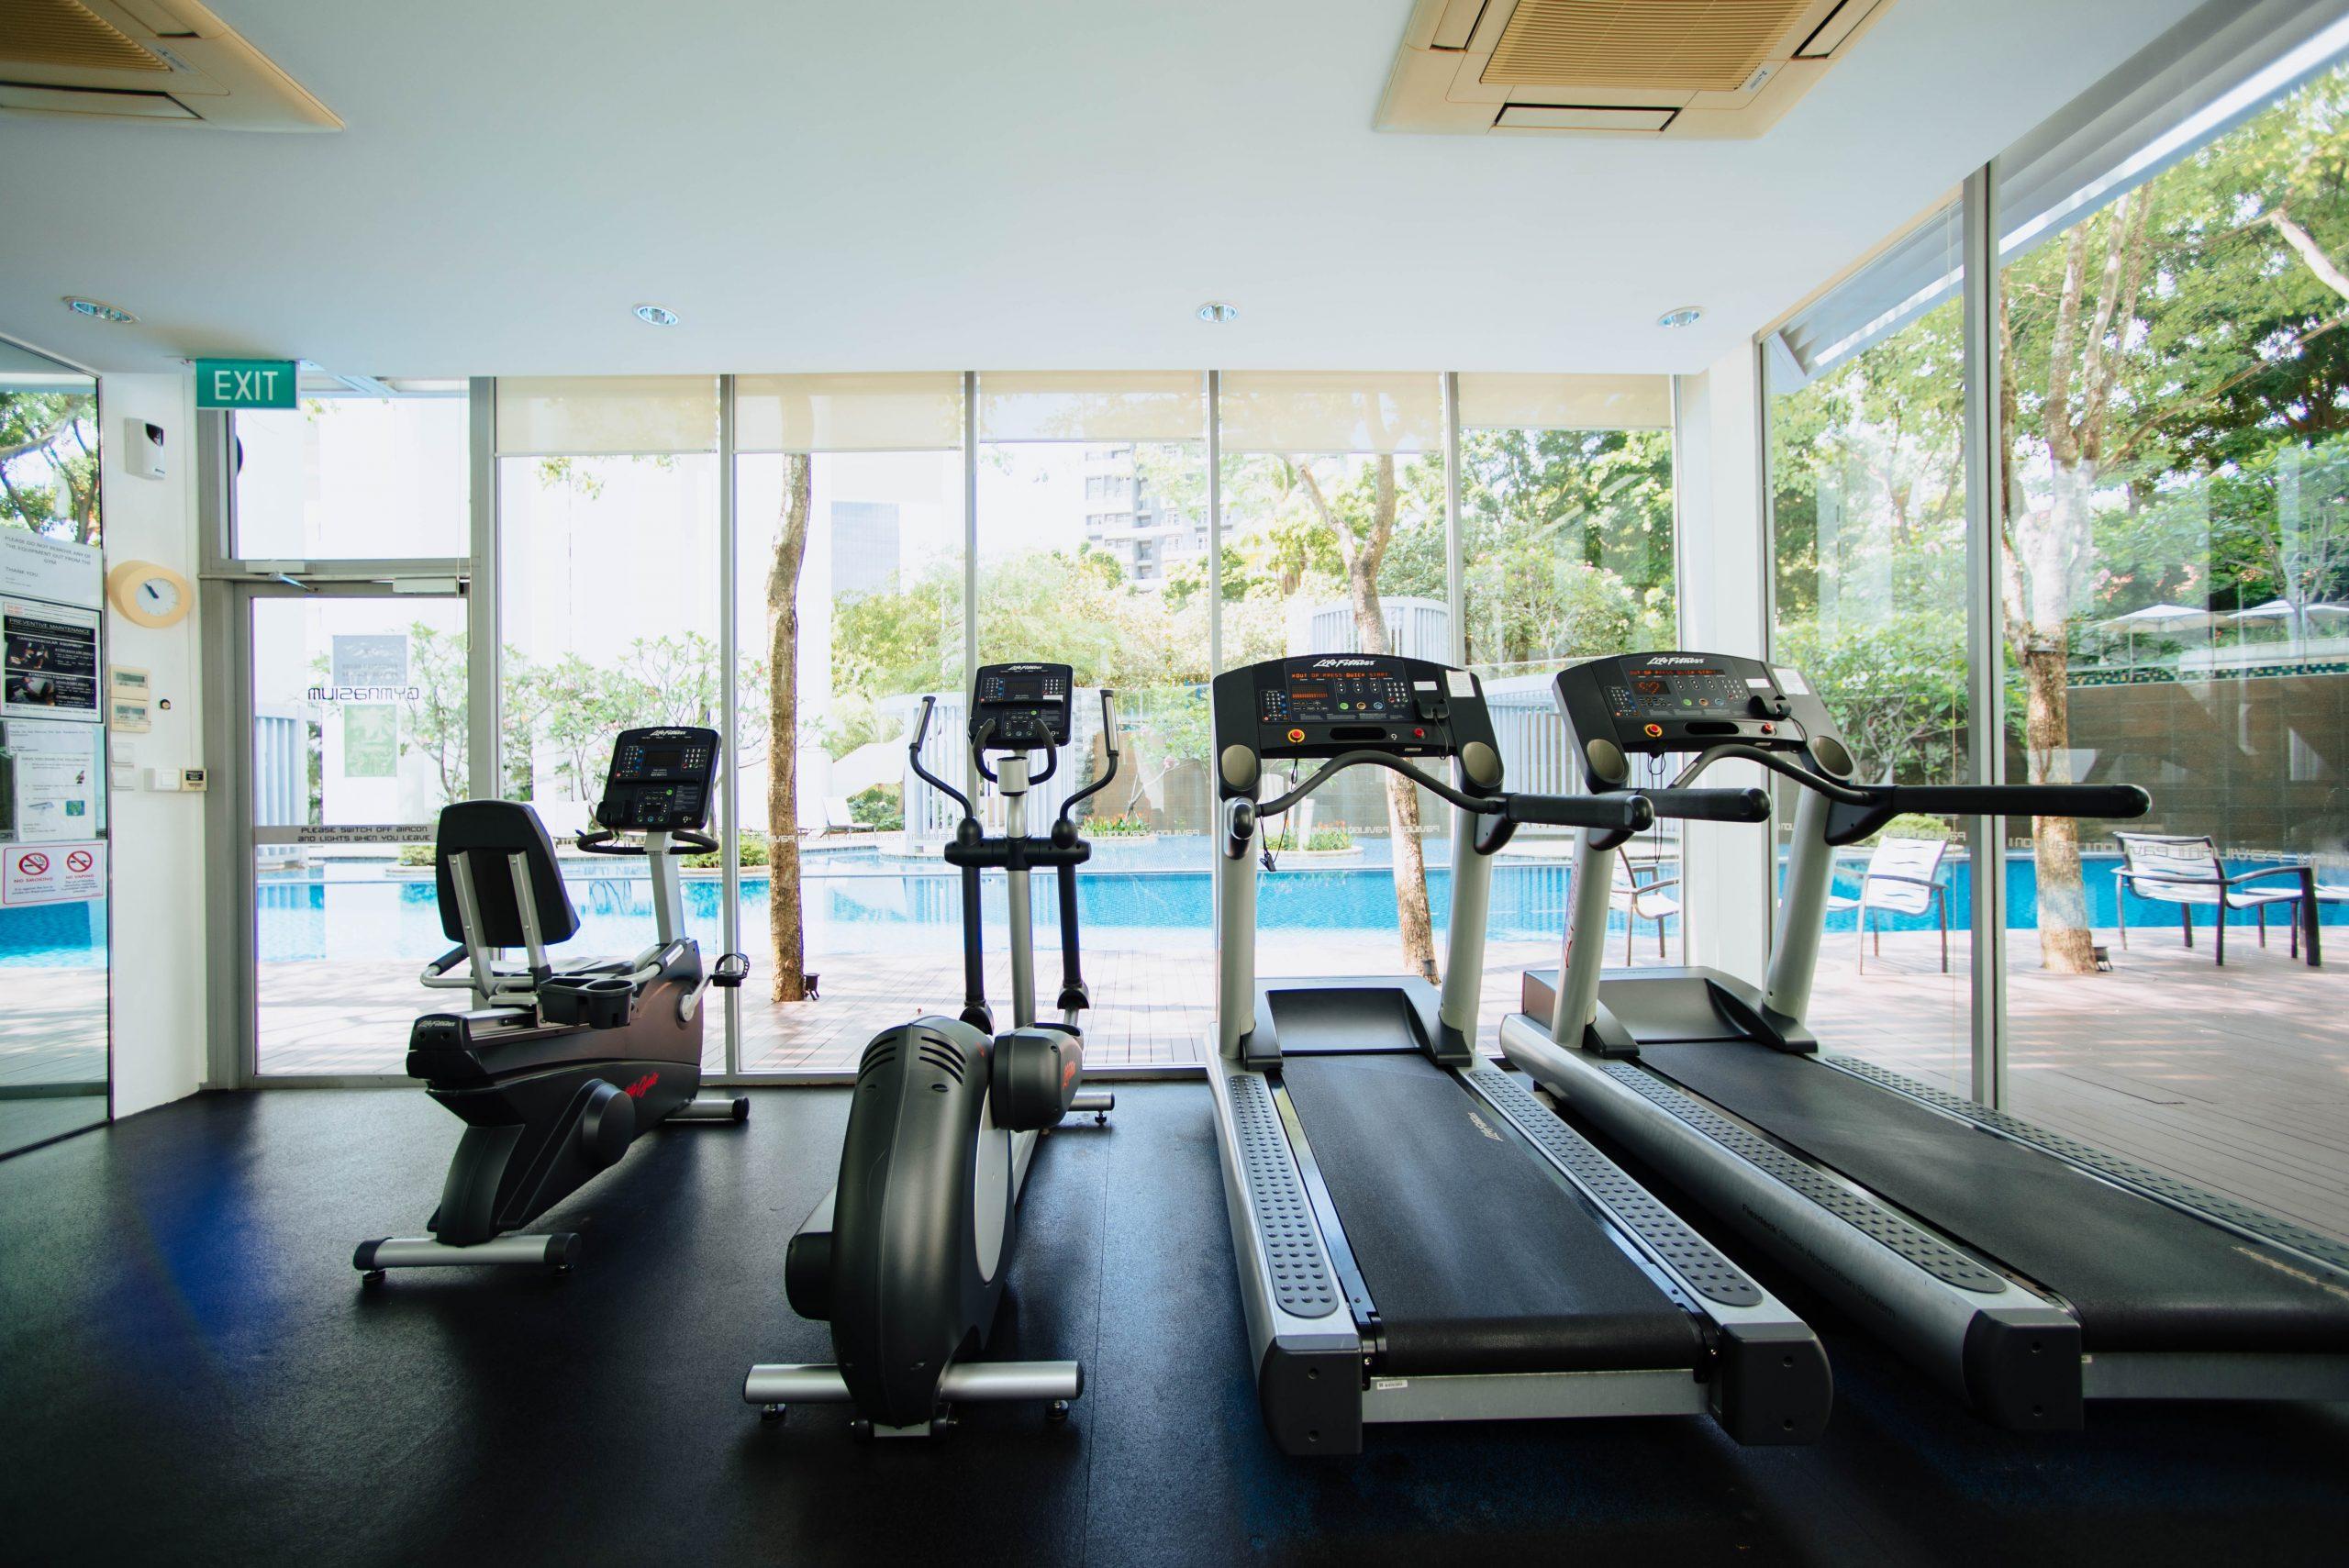 miami-dade gyms reopen